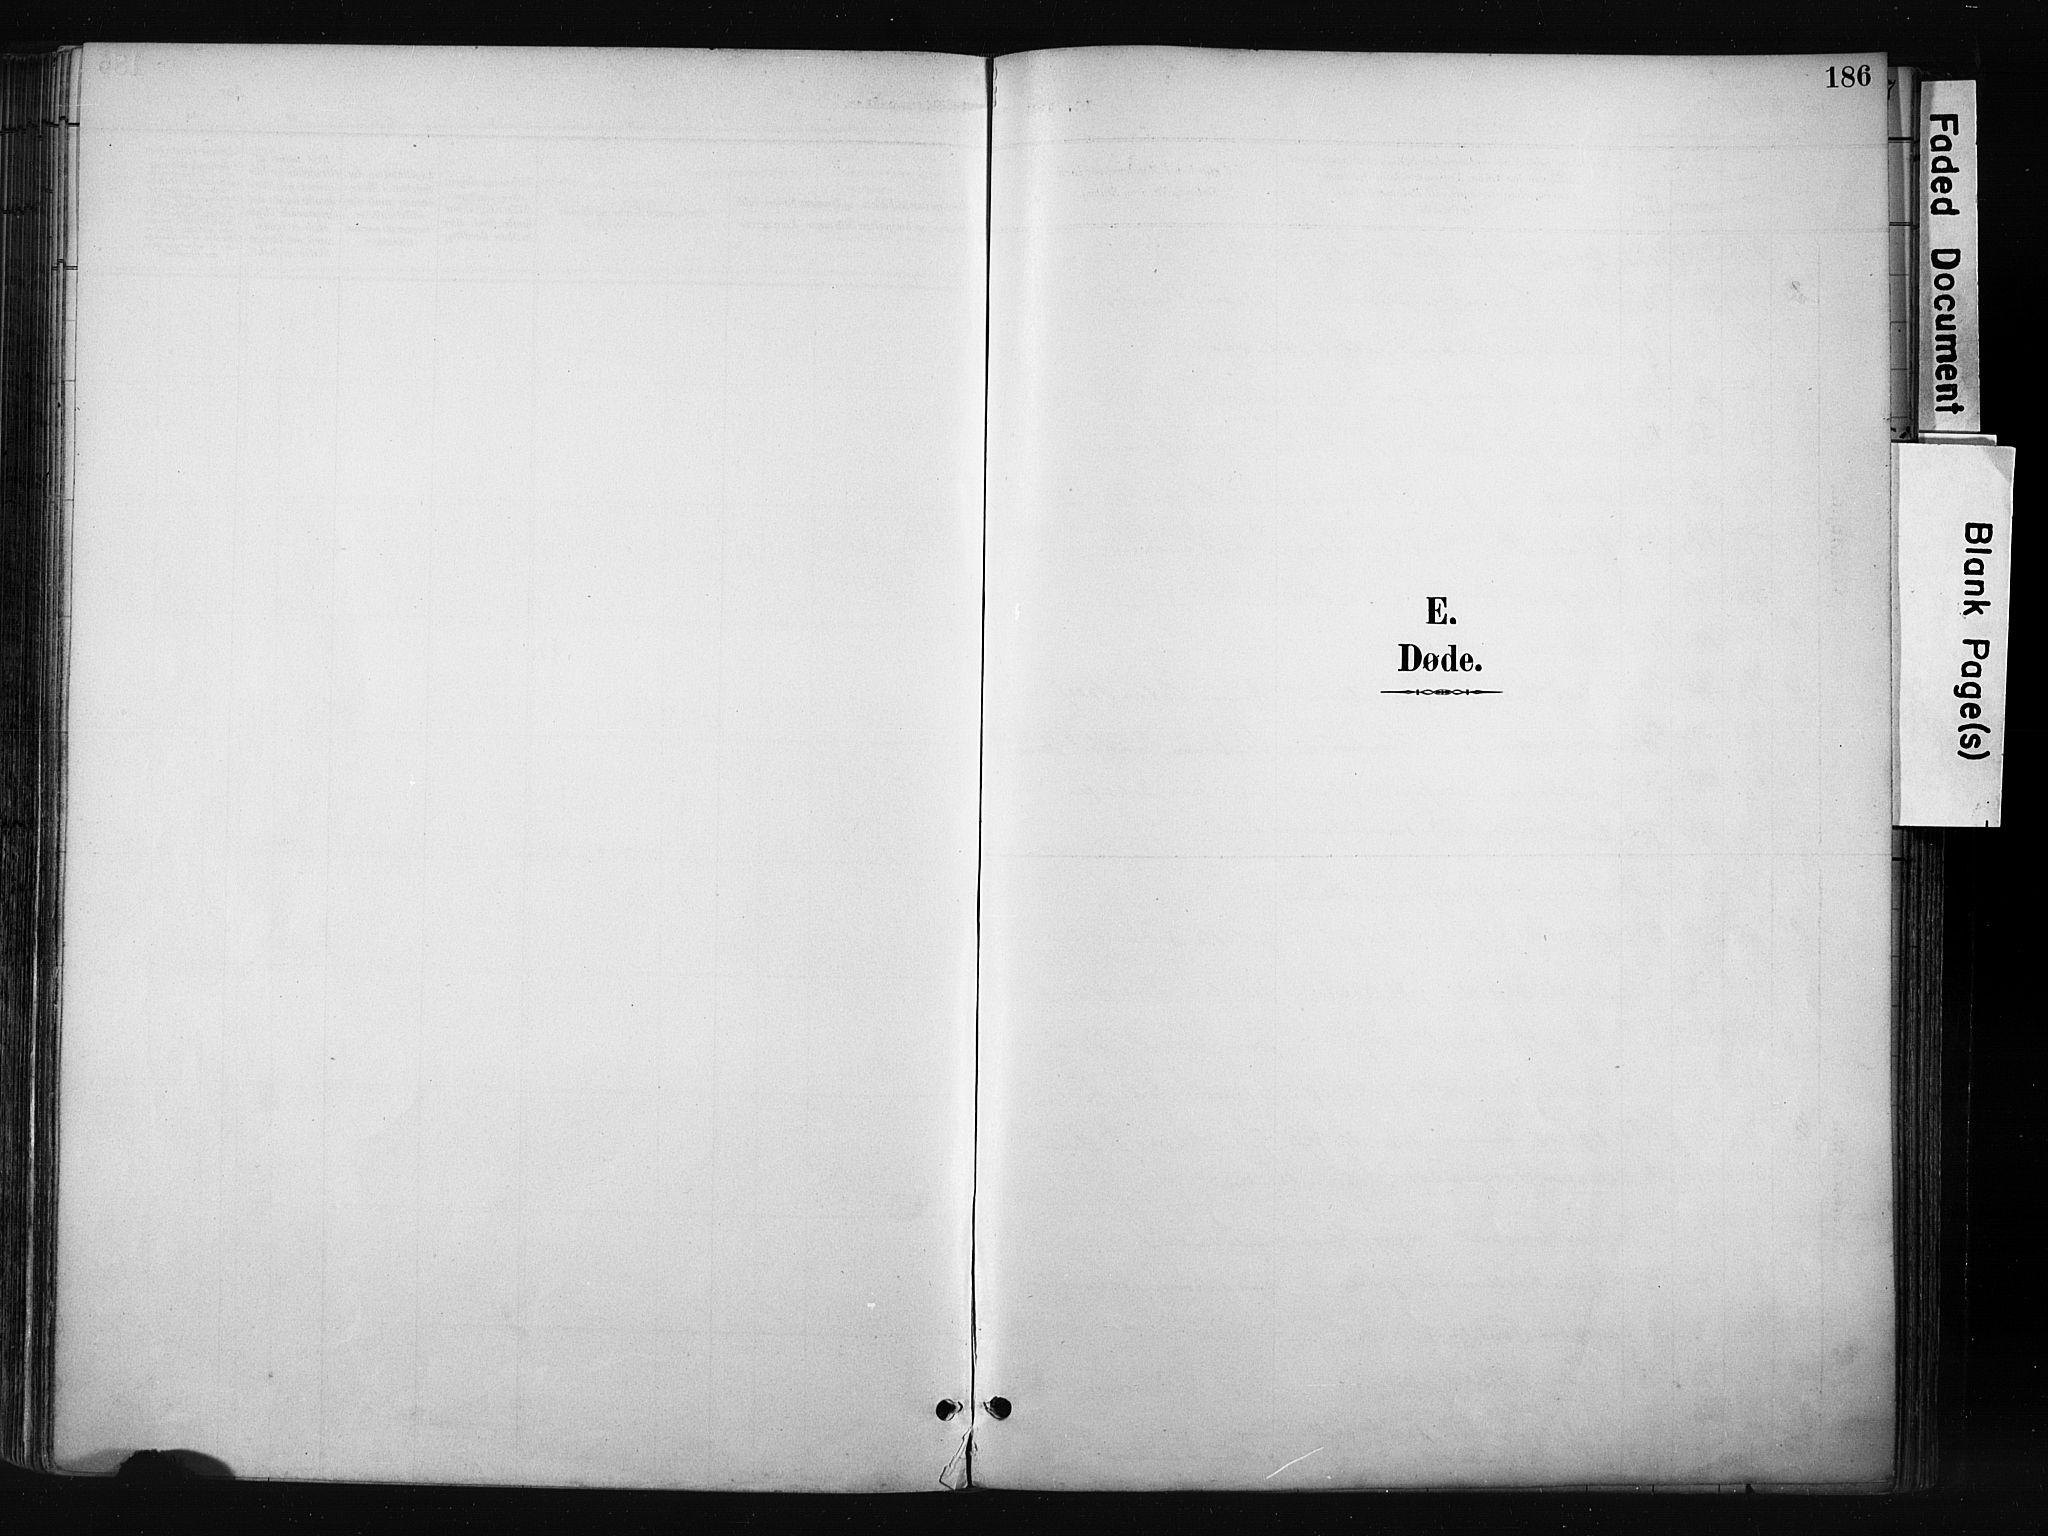 SAH, Gran prestekontor, Ministerialbok nr. 17, 1889-1897, s. 186